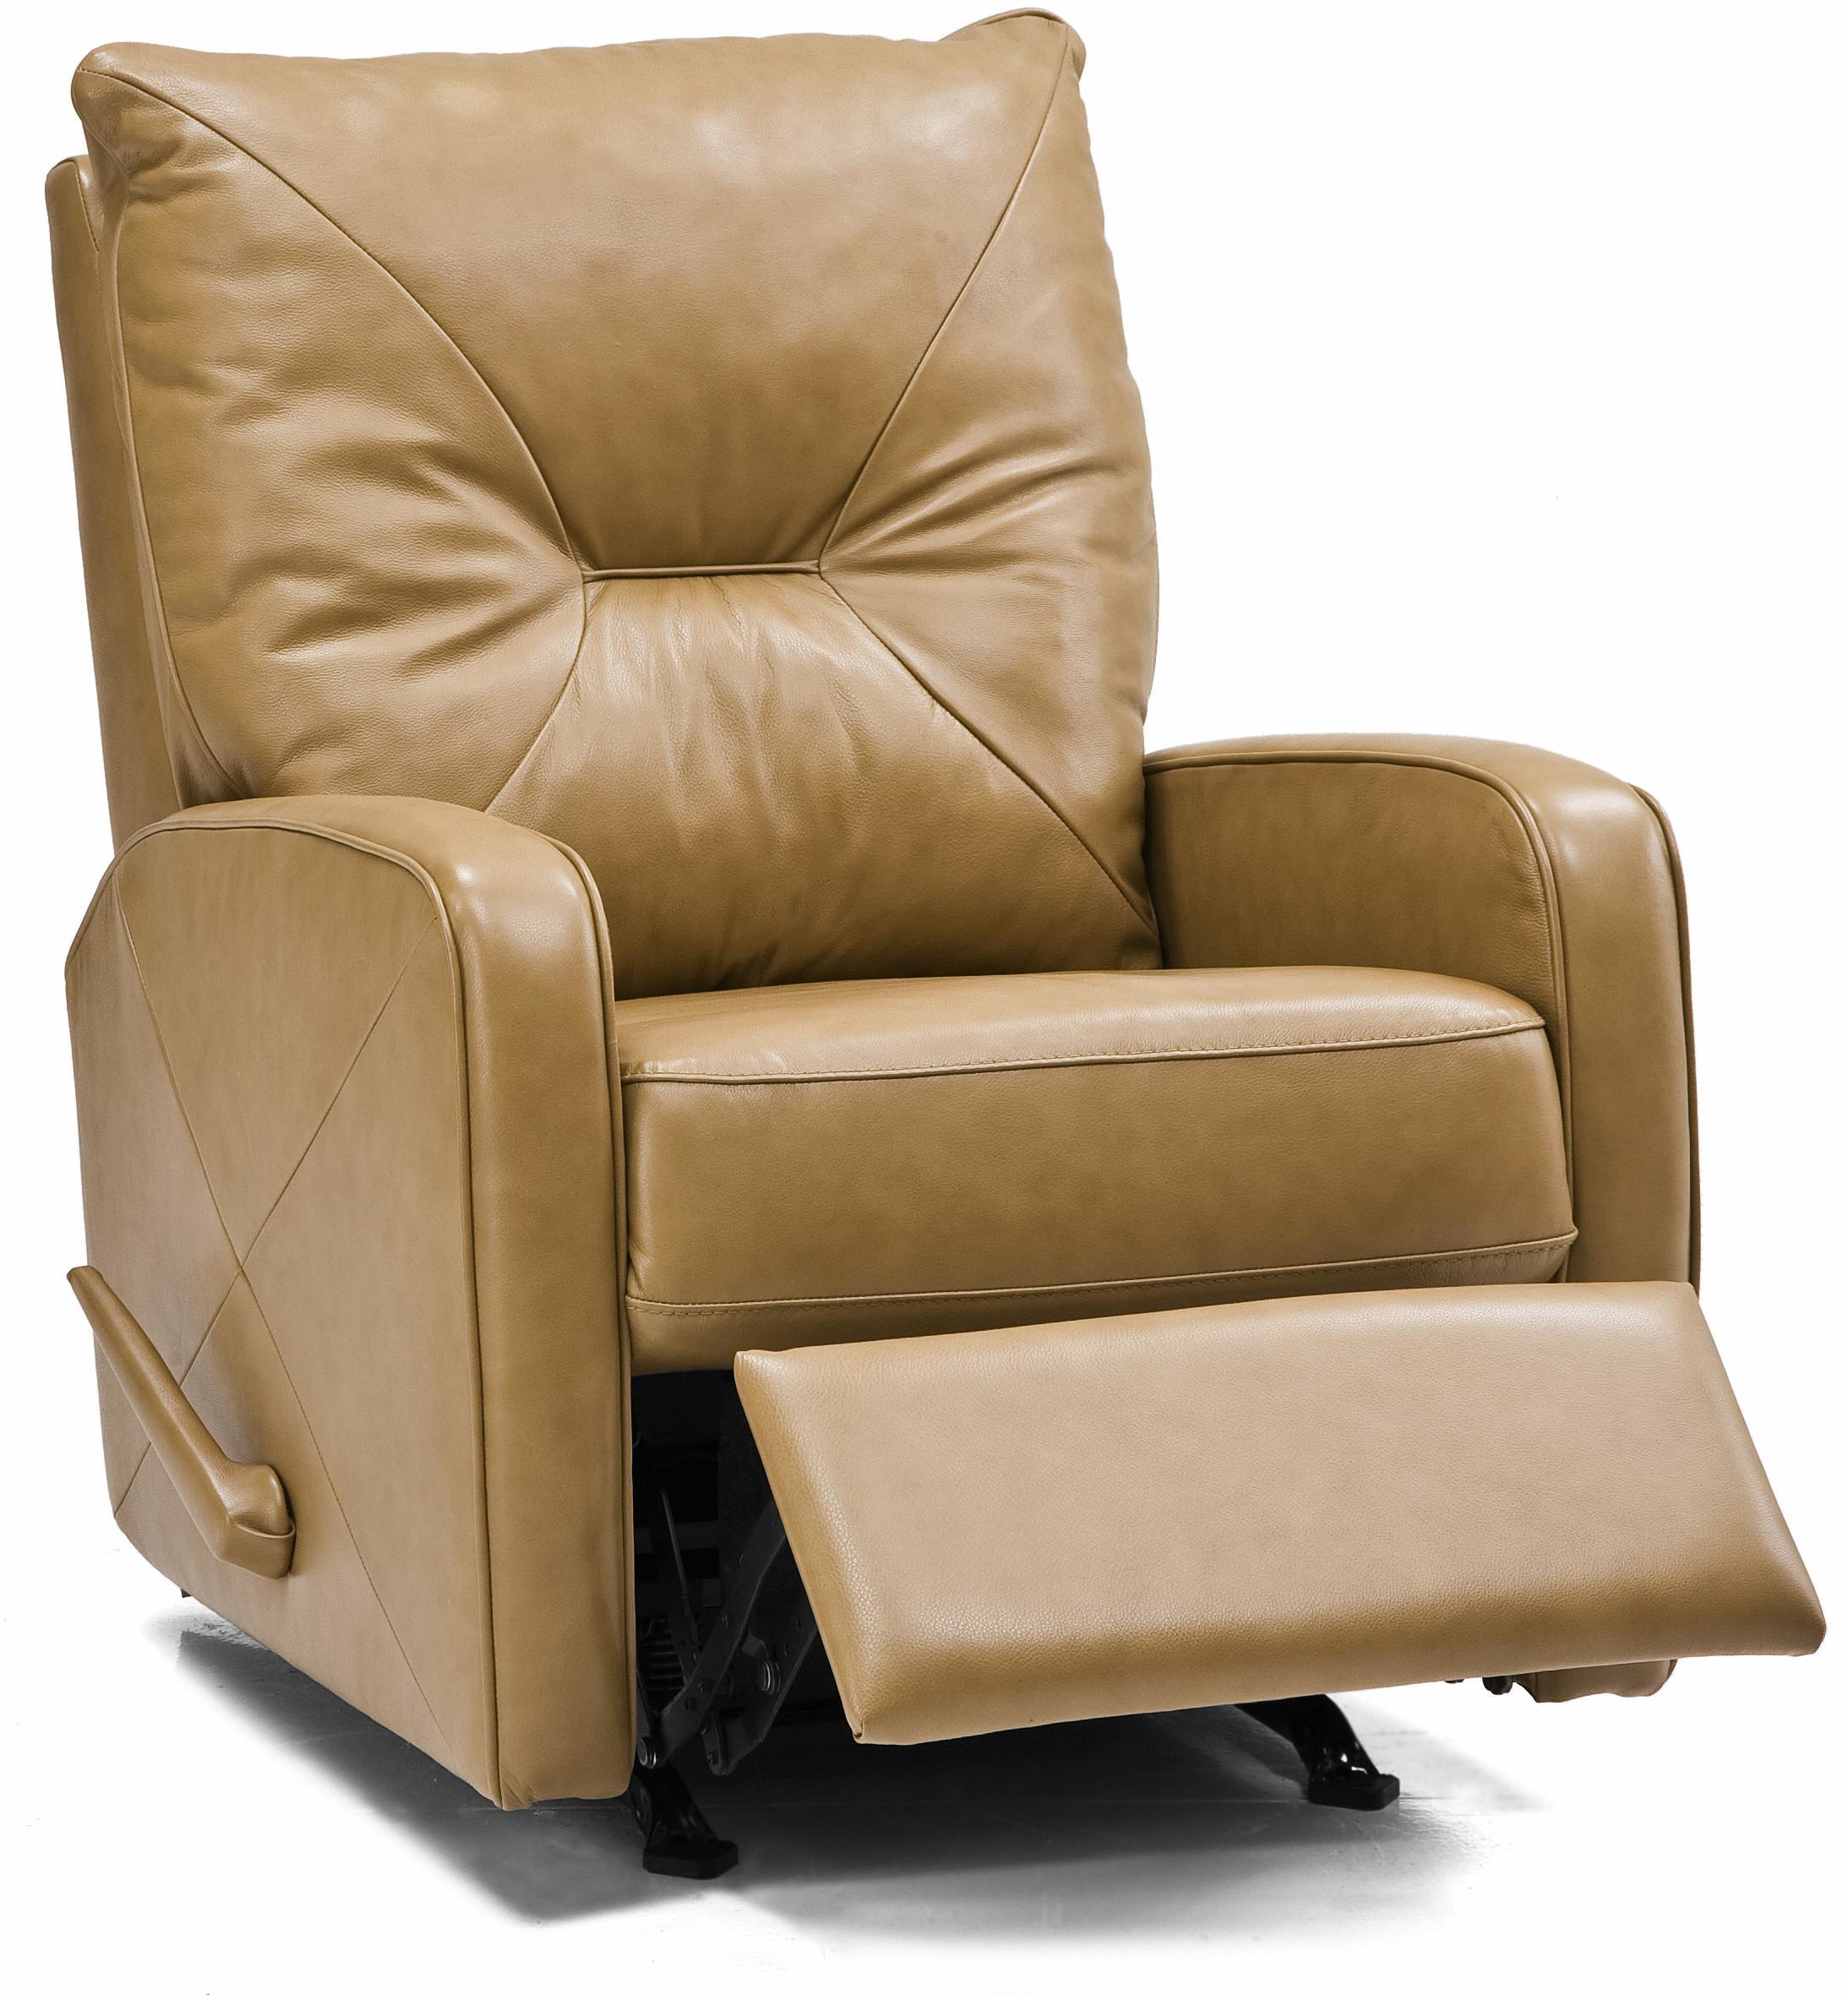 rocking reclining chair patio rocker palliser theo olinde 39s furniture